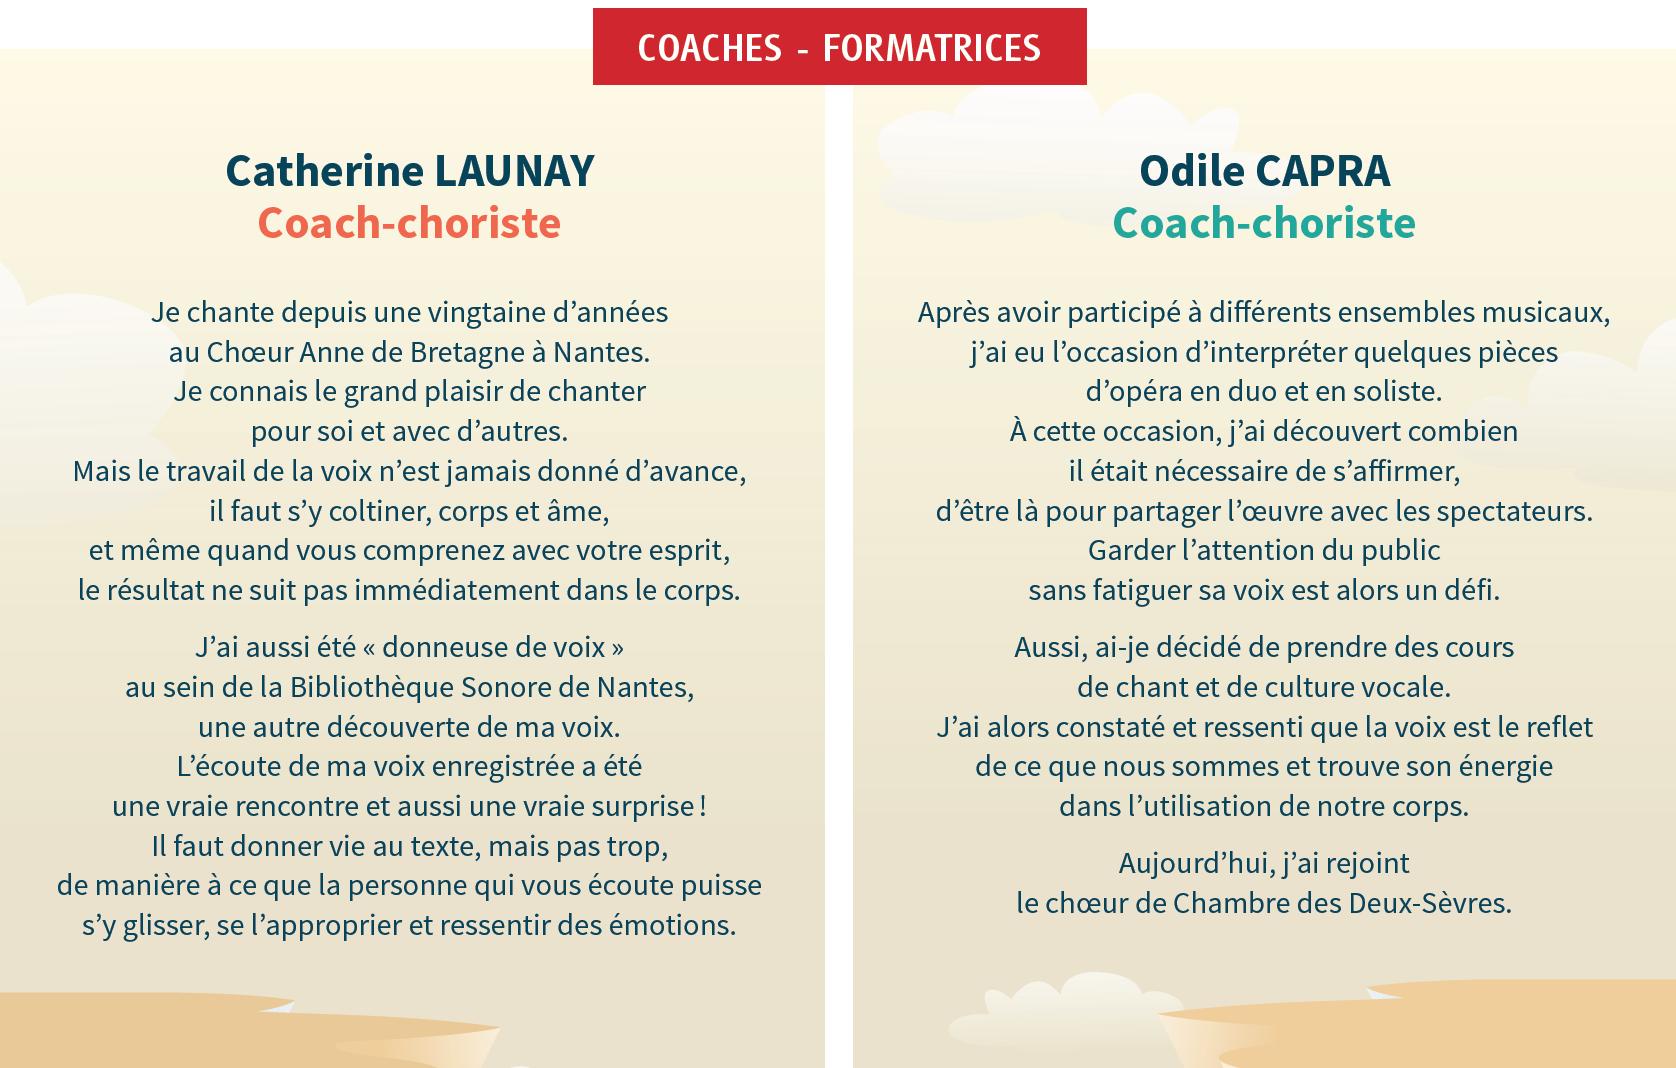 Catherine Launay et Odile Capra